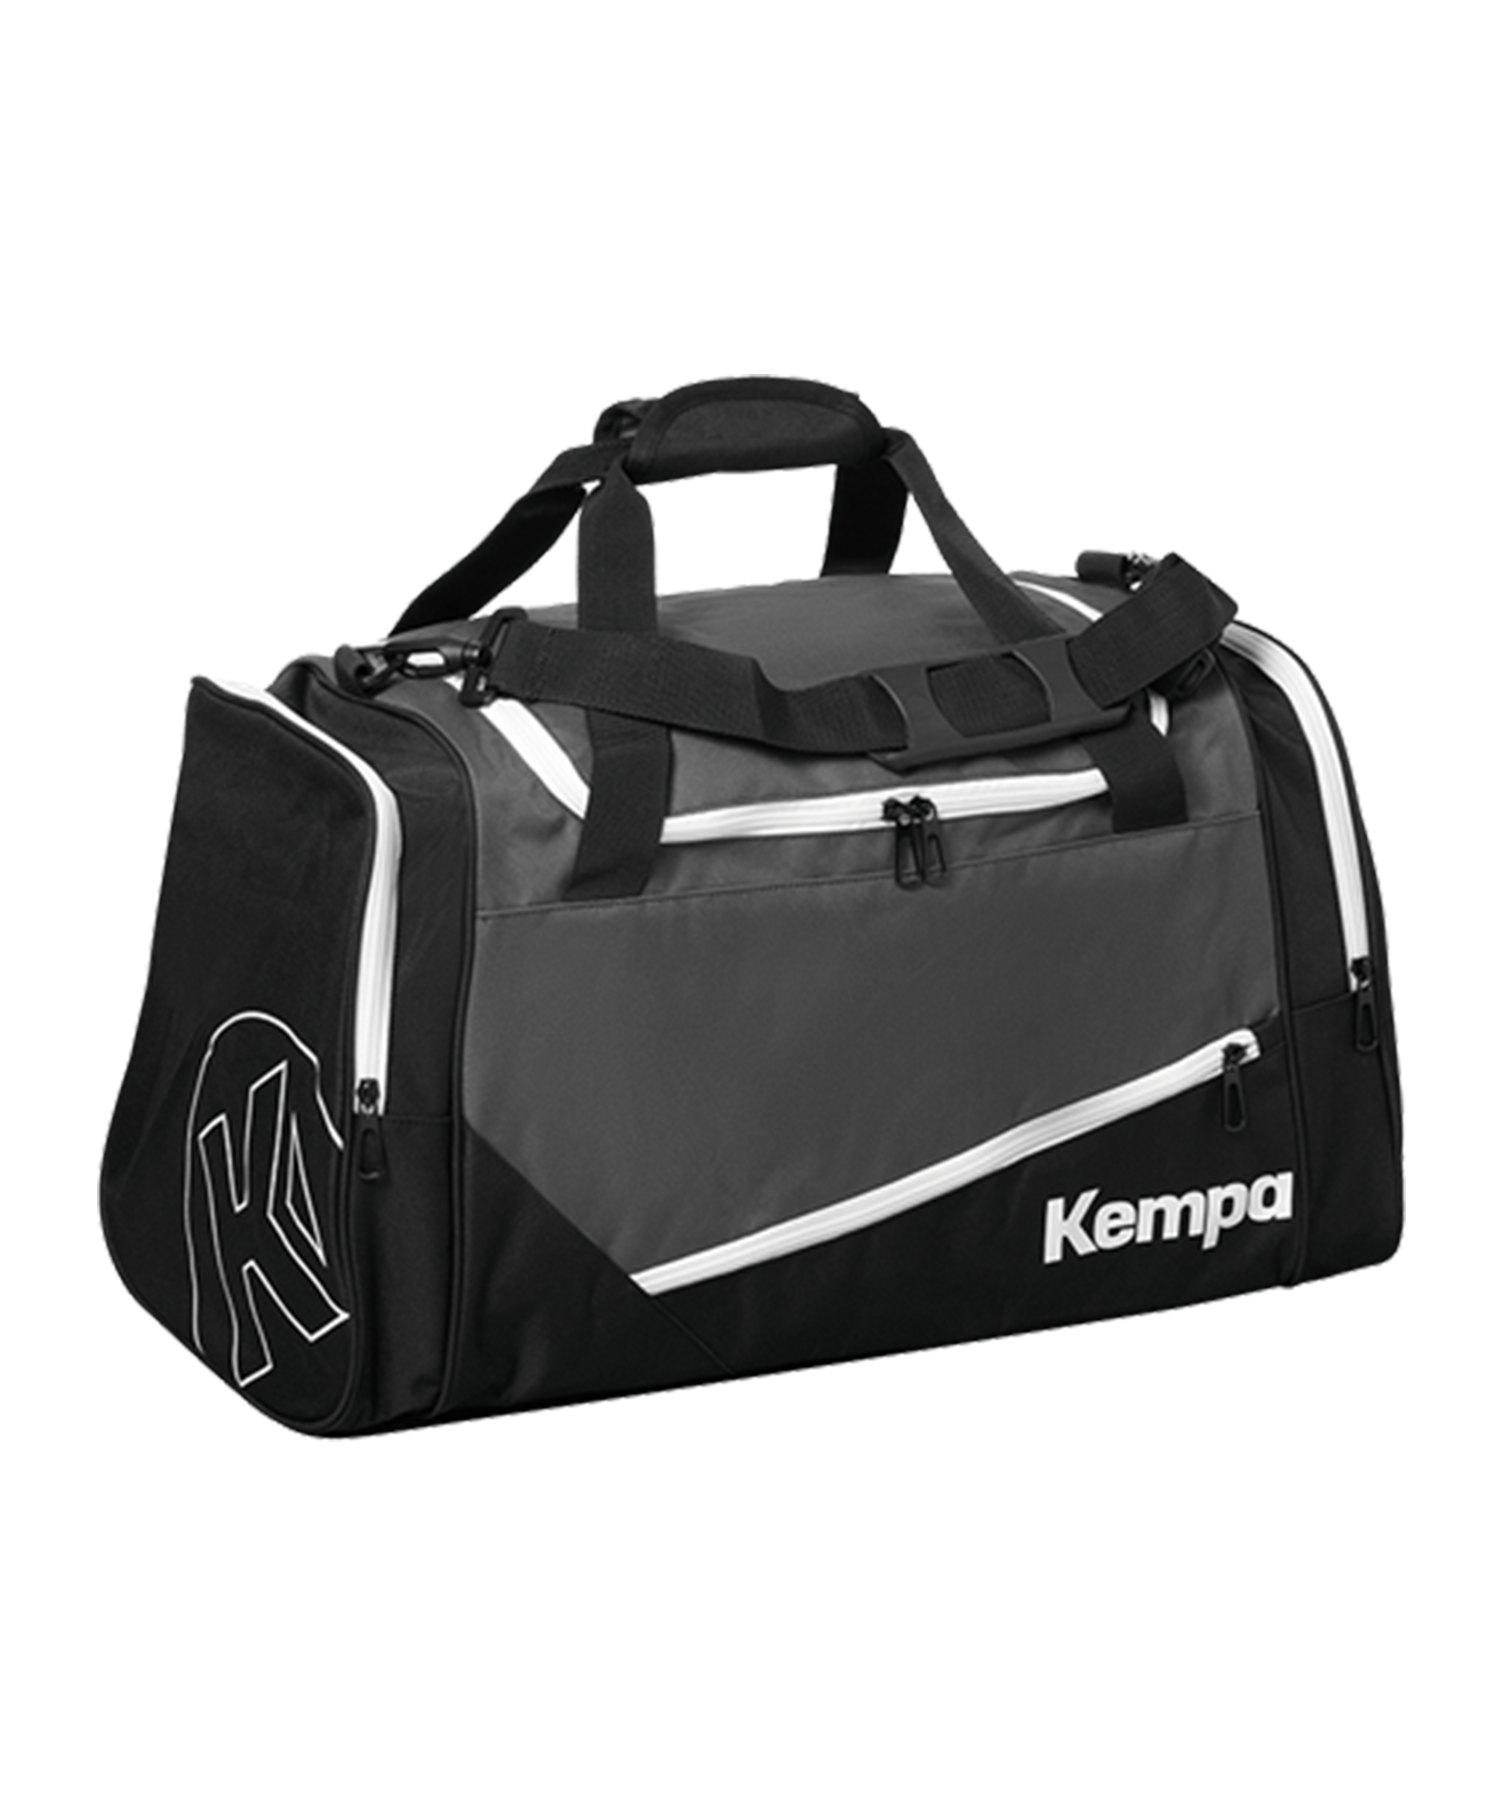 Kempa Sports Bag Sporttasche Medium Schwarz F01 - grau